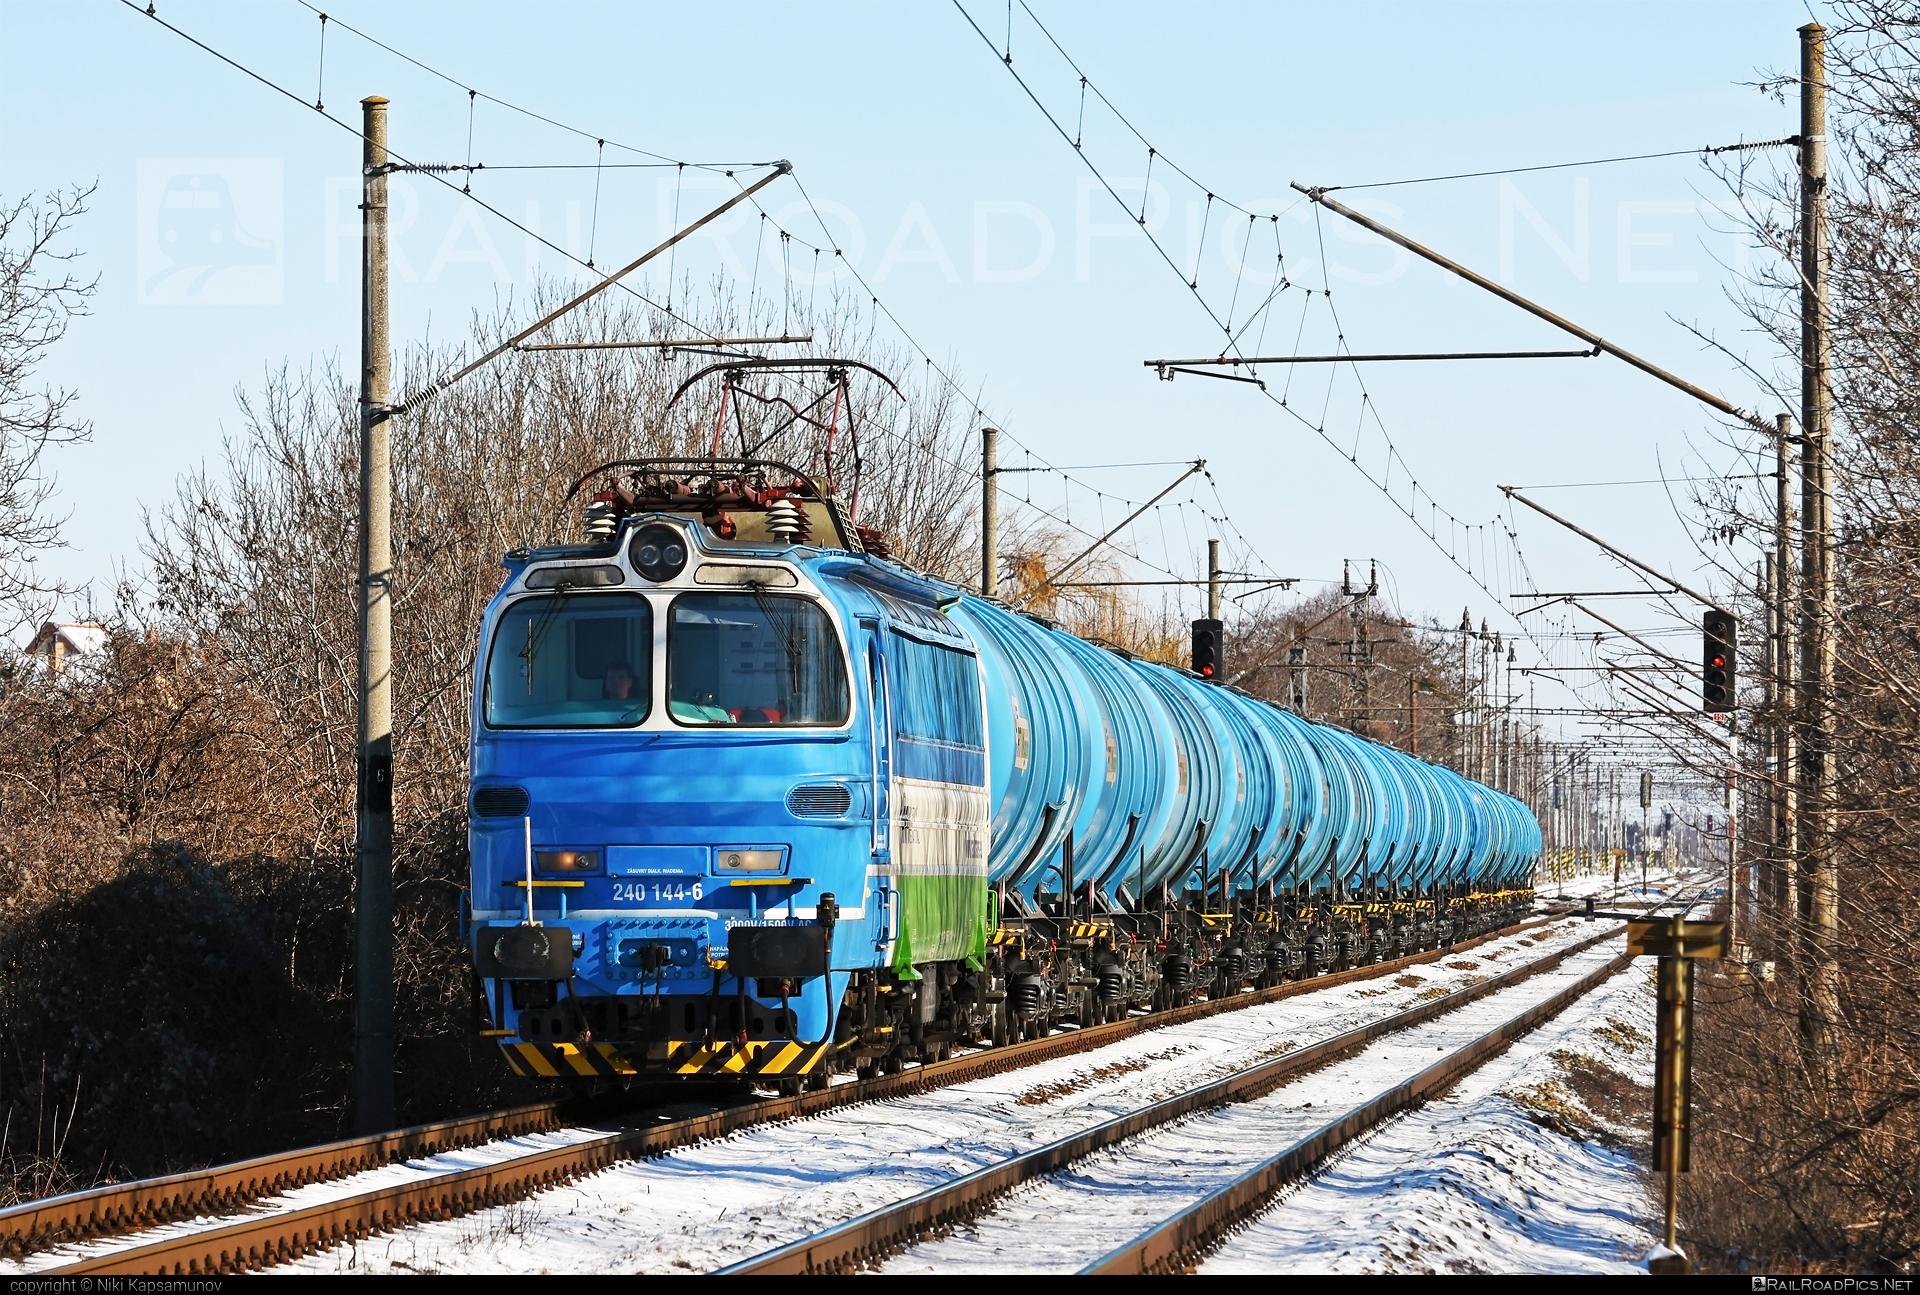 Škoda 47E - 240 144-6 operated by Railtrans International, s.r.o #RailtransInternational #kesselwagen #laminatka #locomotive240 #rti #skoda #skoda47e #tankwagon